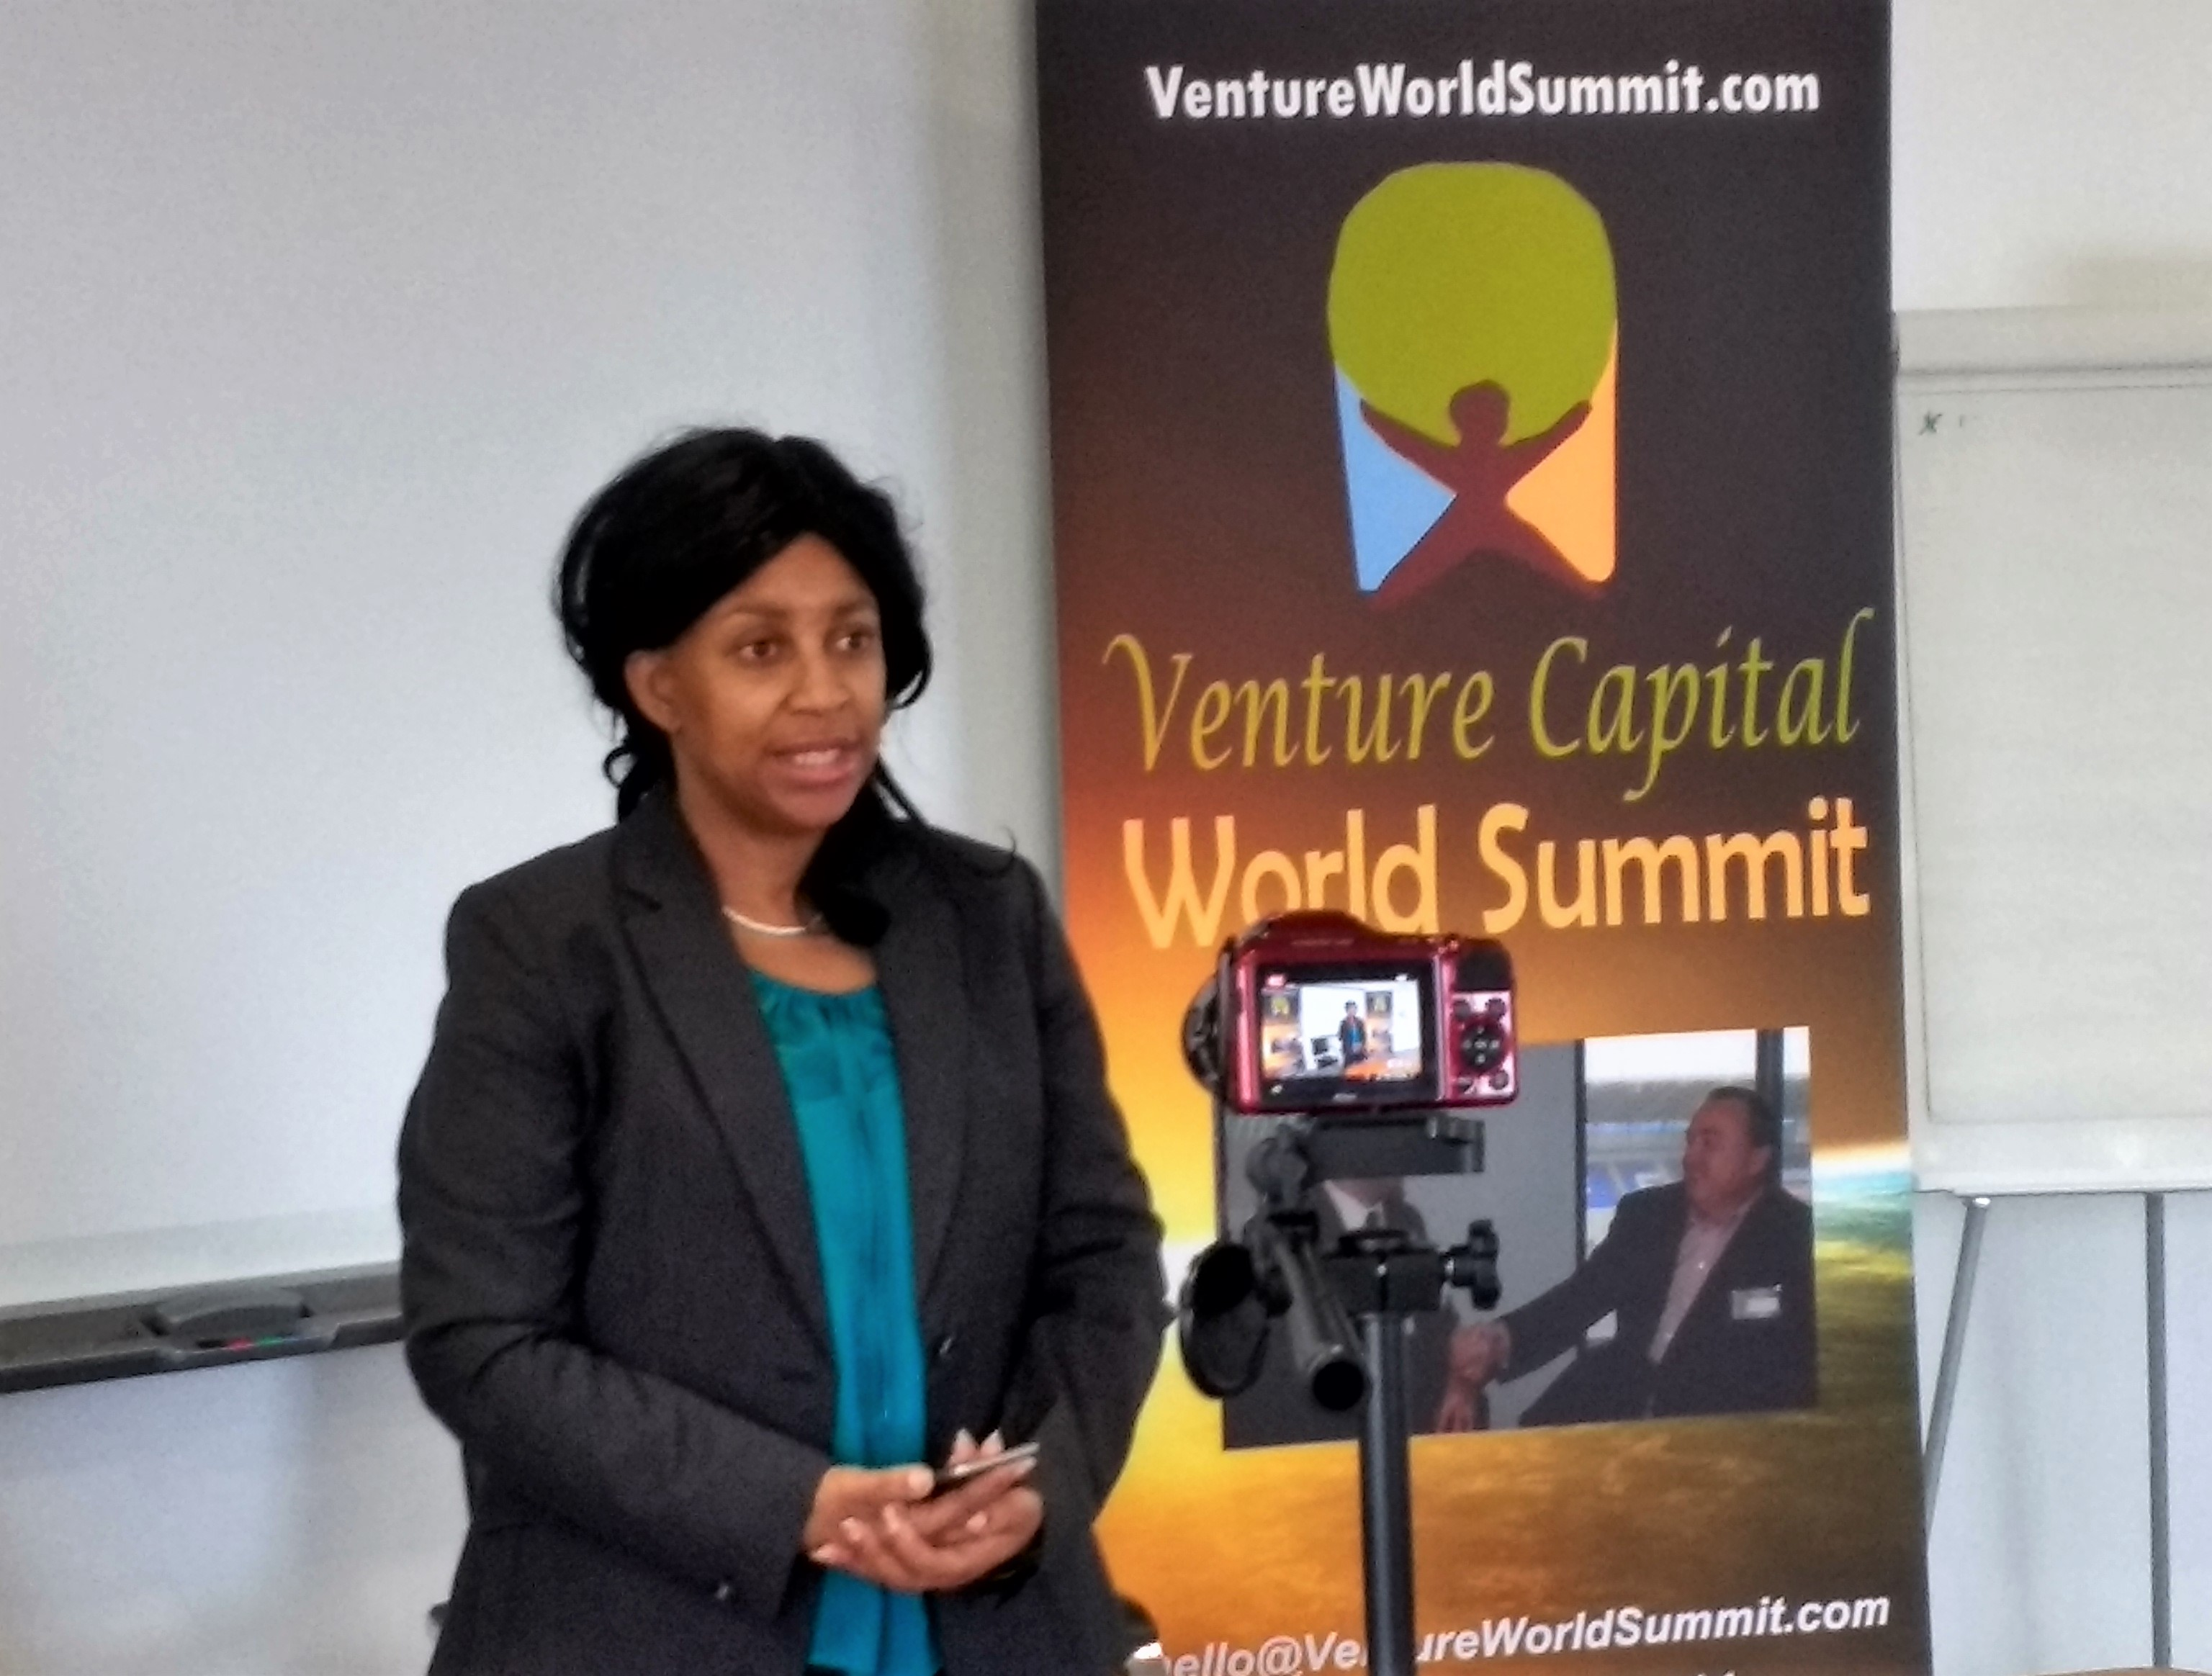 Cardiff 2017 Venture Capital World Summit